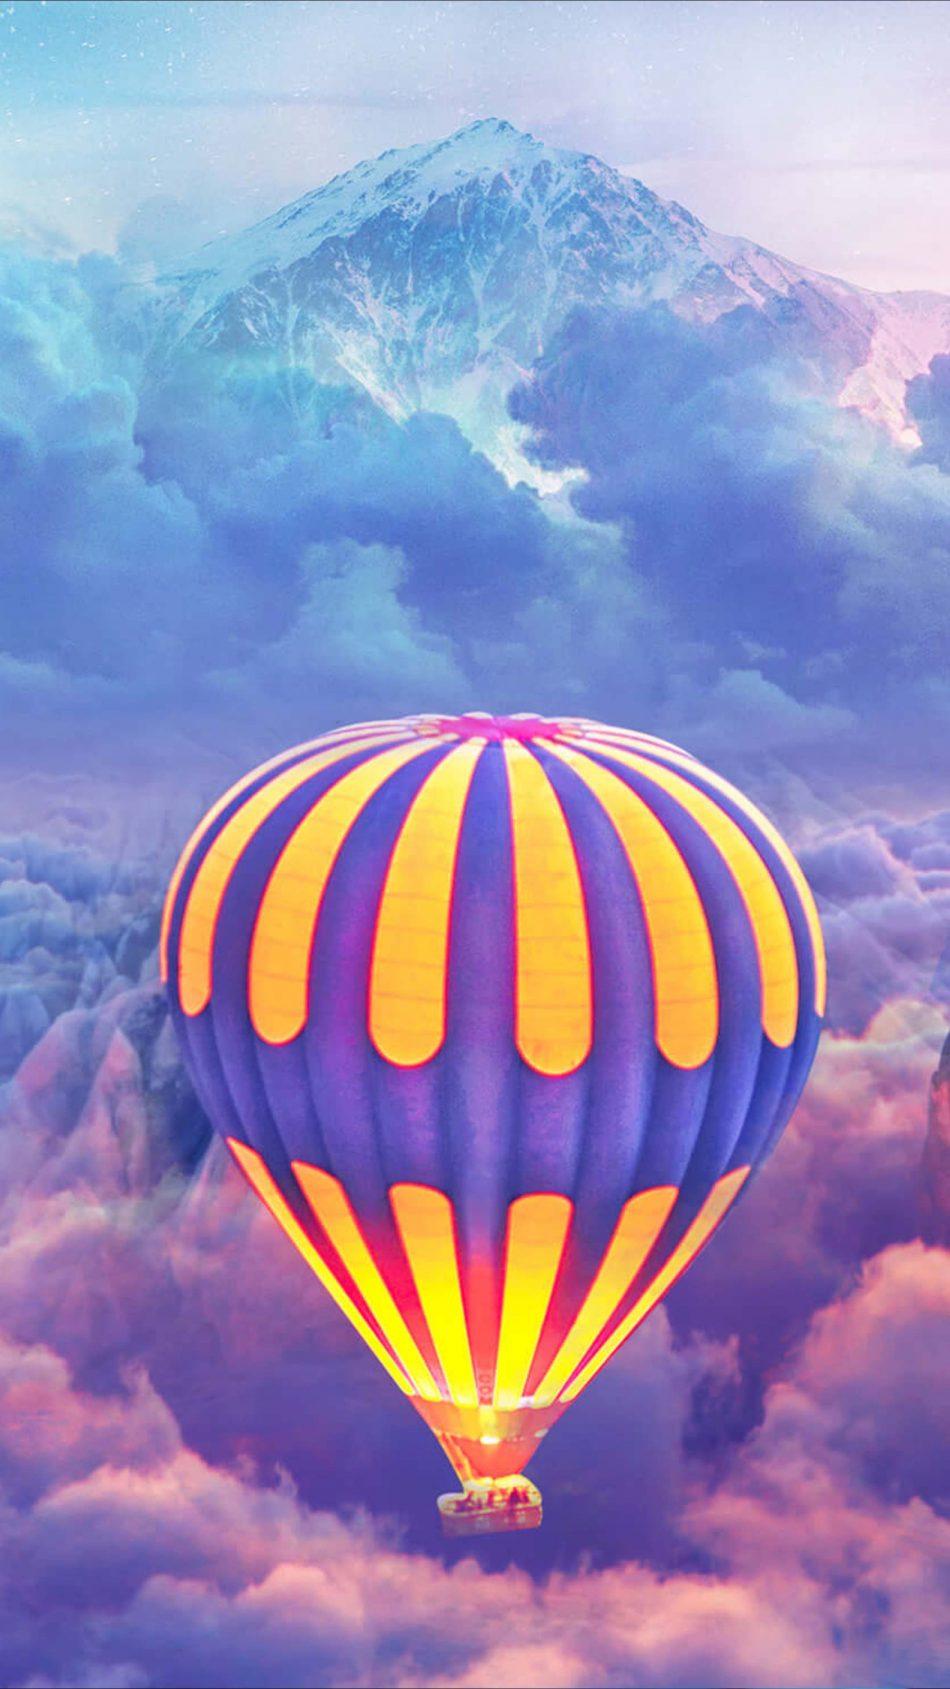 Hot Air Balloons Over The Cloud Mountain 4K Ultra HD Mobile Wallpaper